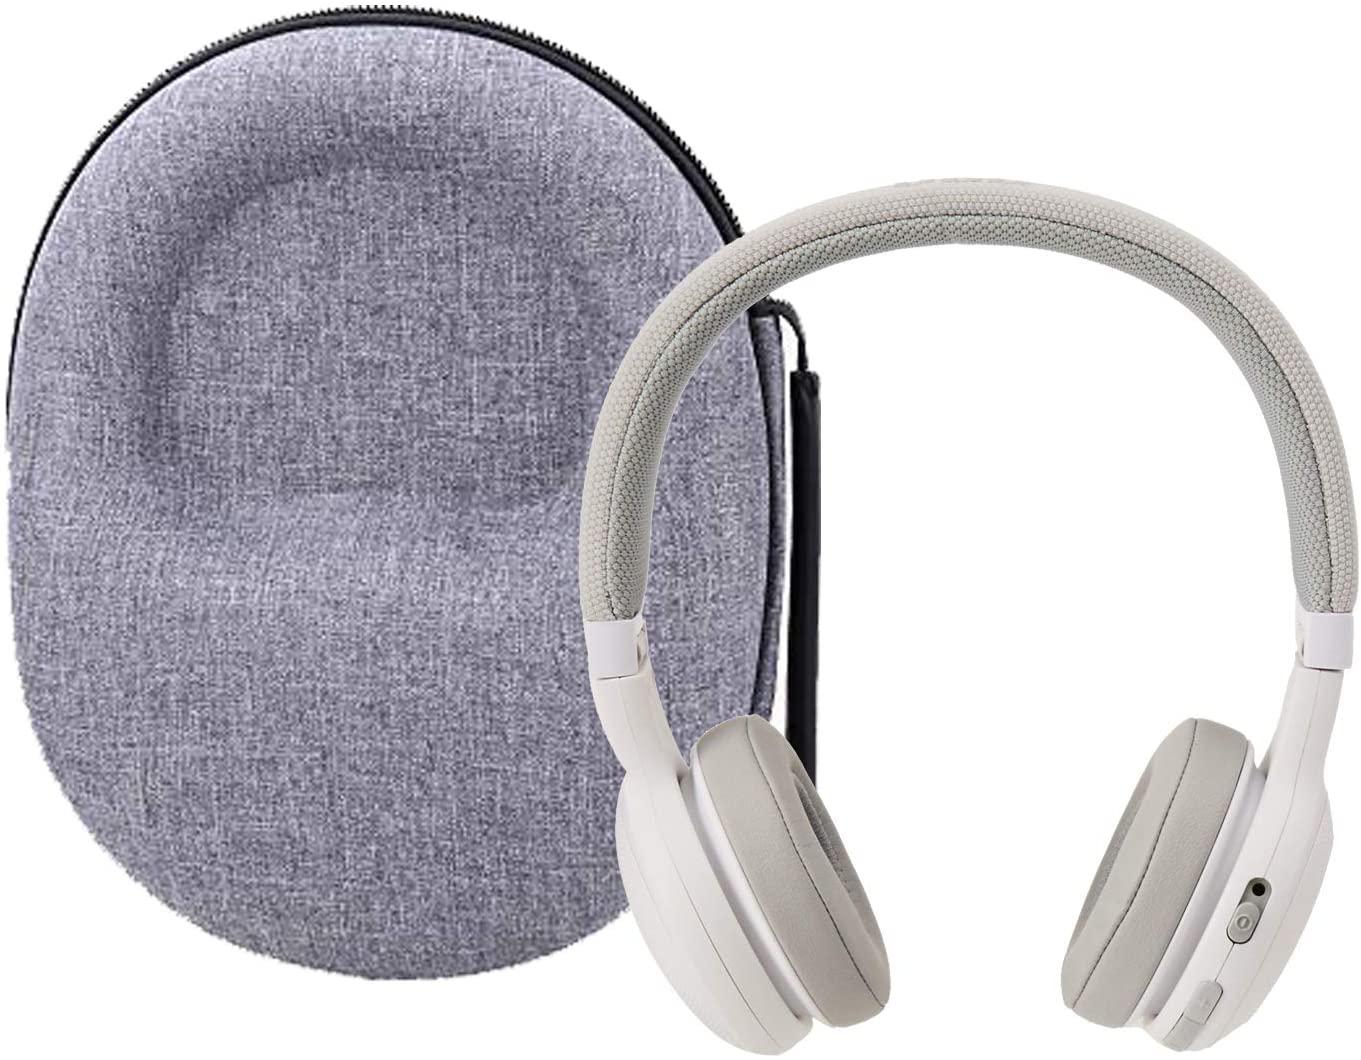 Hard Storage Case for JBL E45BT/E55BT On-Ear Wireless Headphones by Aenllosi(Gray)